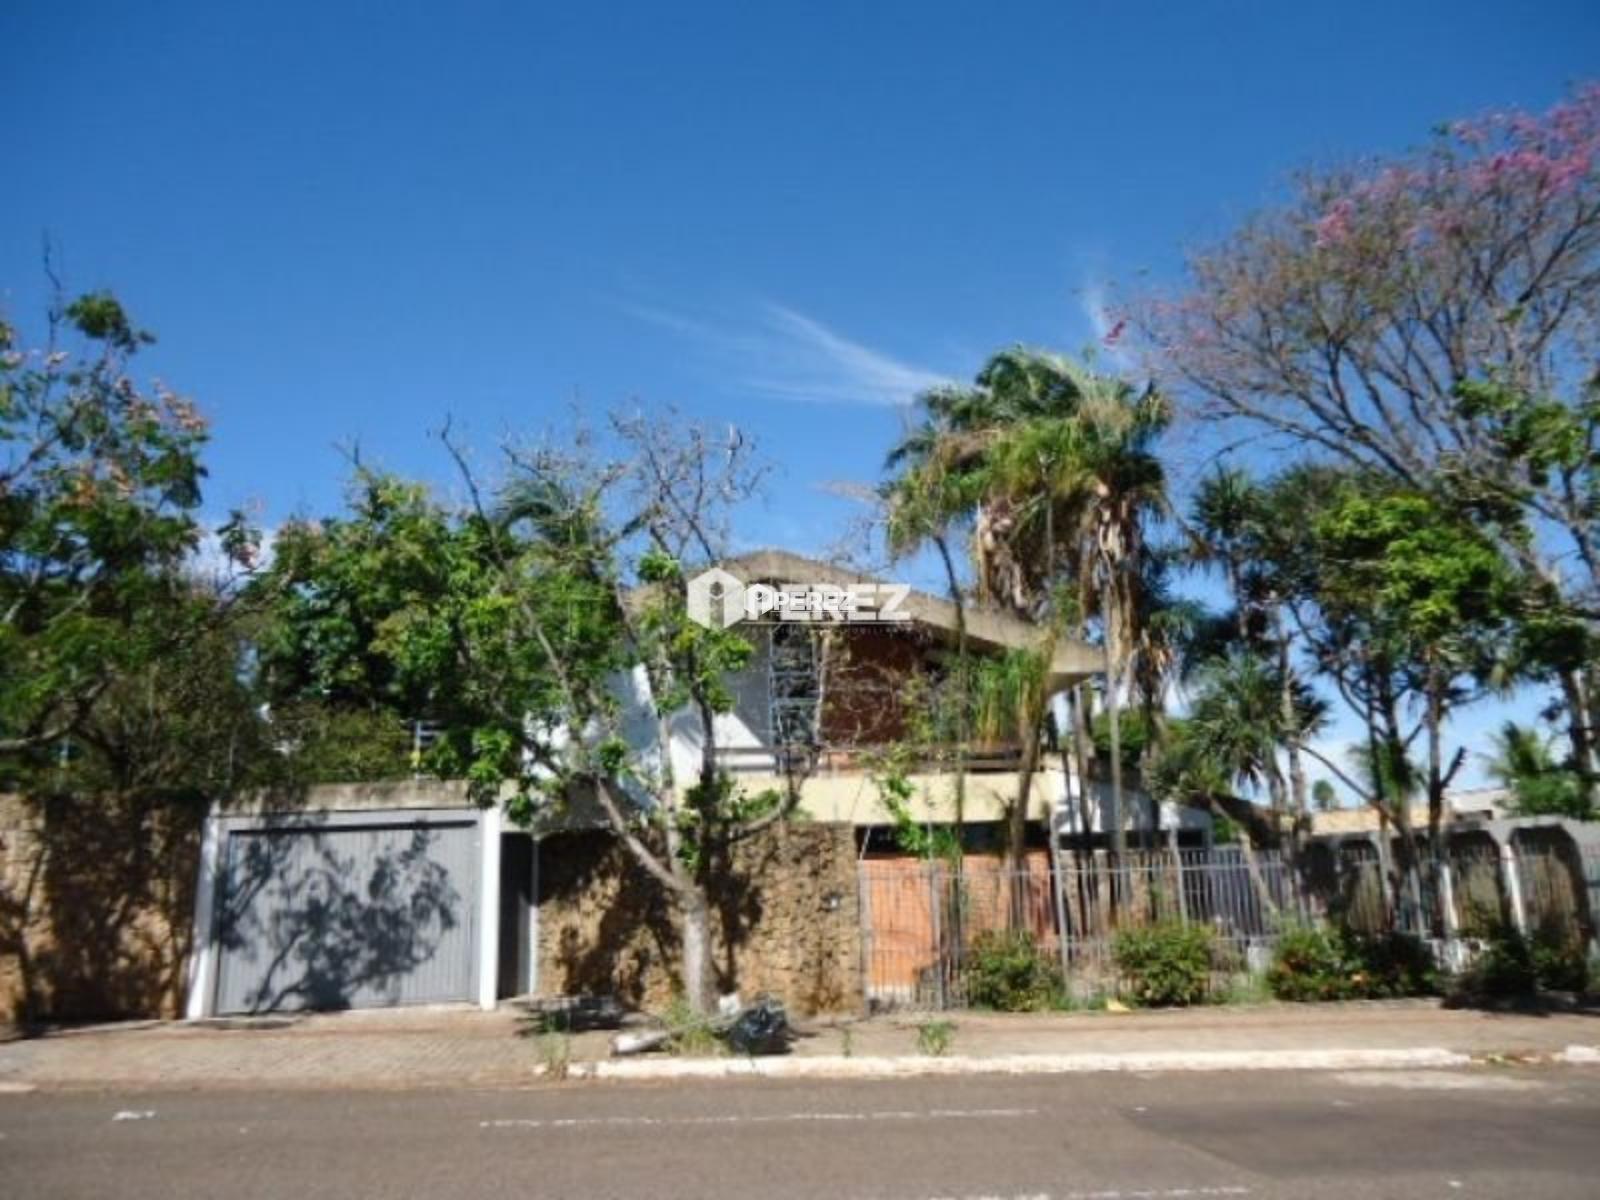 aluguel-campo-grande-ms-casa-comercial-antonio-maria-coelho-jardim-dos-estados-perez-imoveis